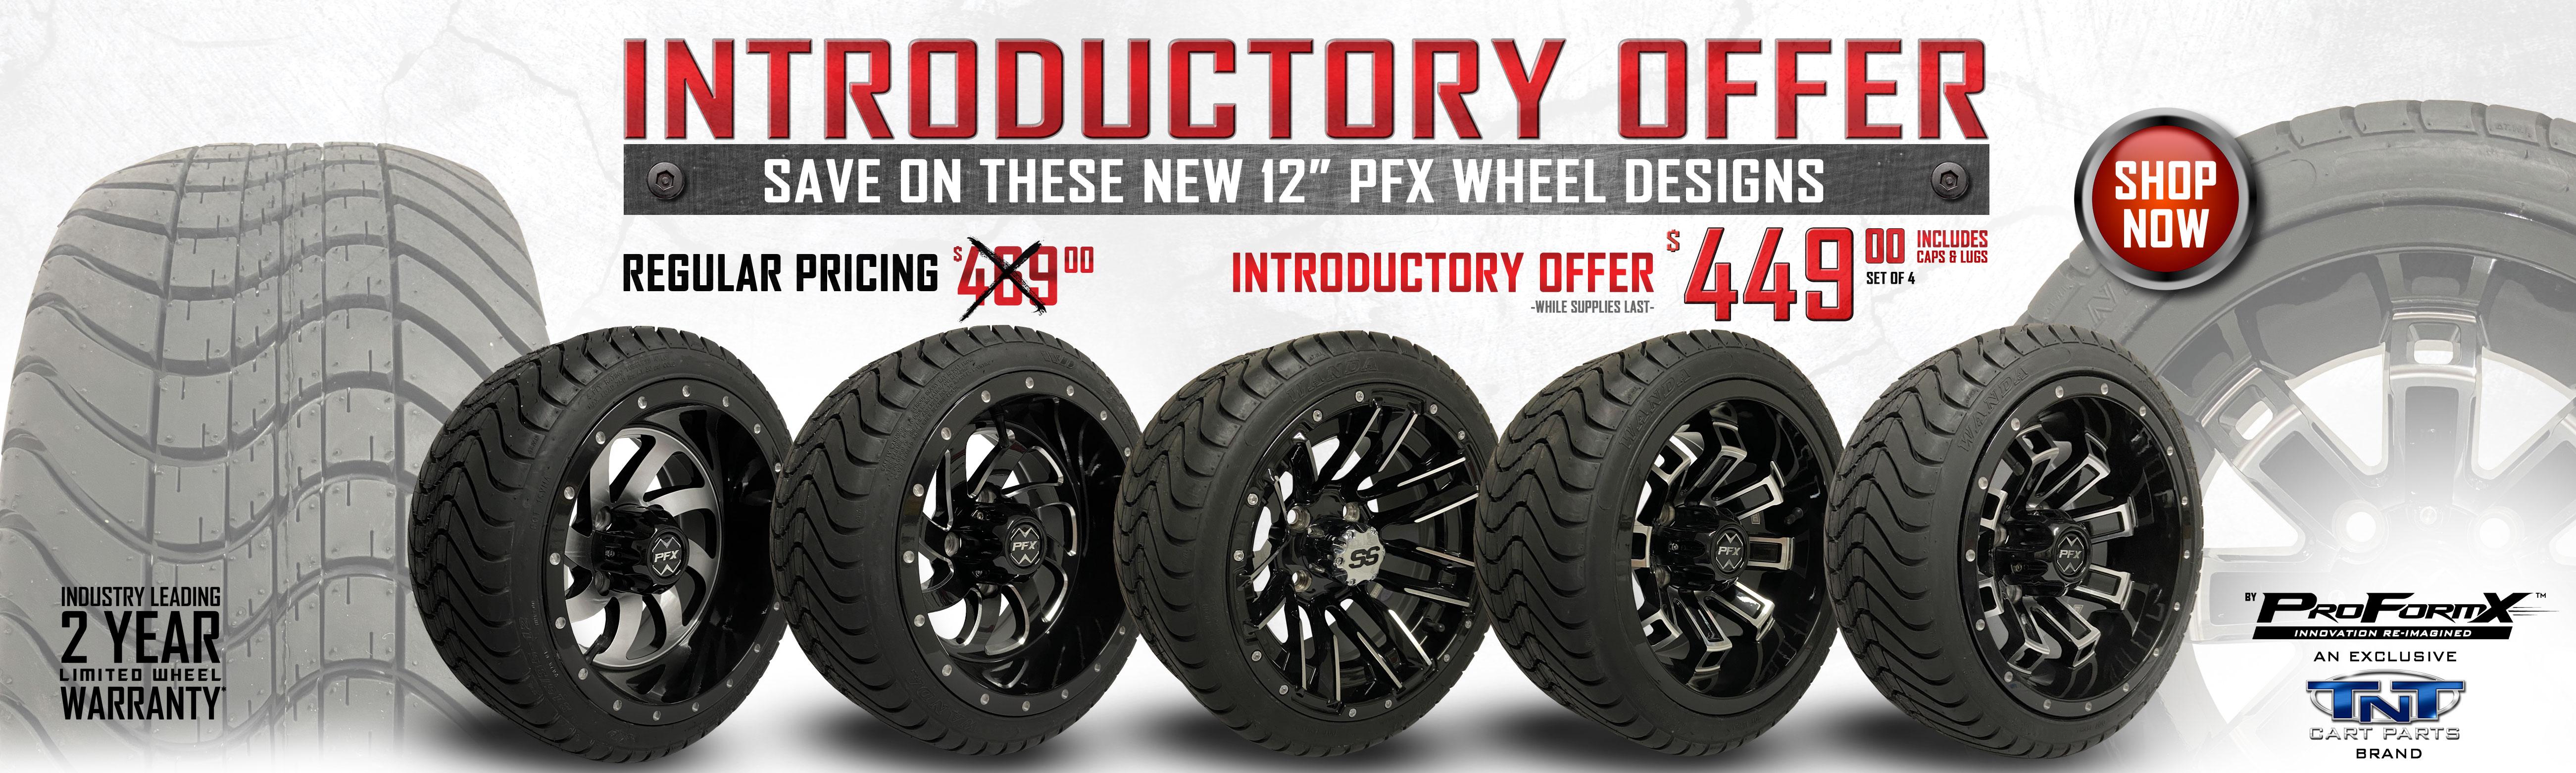 pfx-wheel-street-tire-combo-banner-1-29-21.jpg